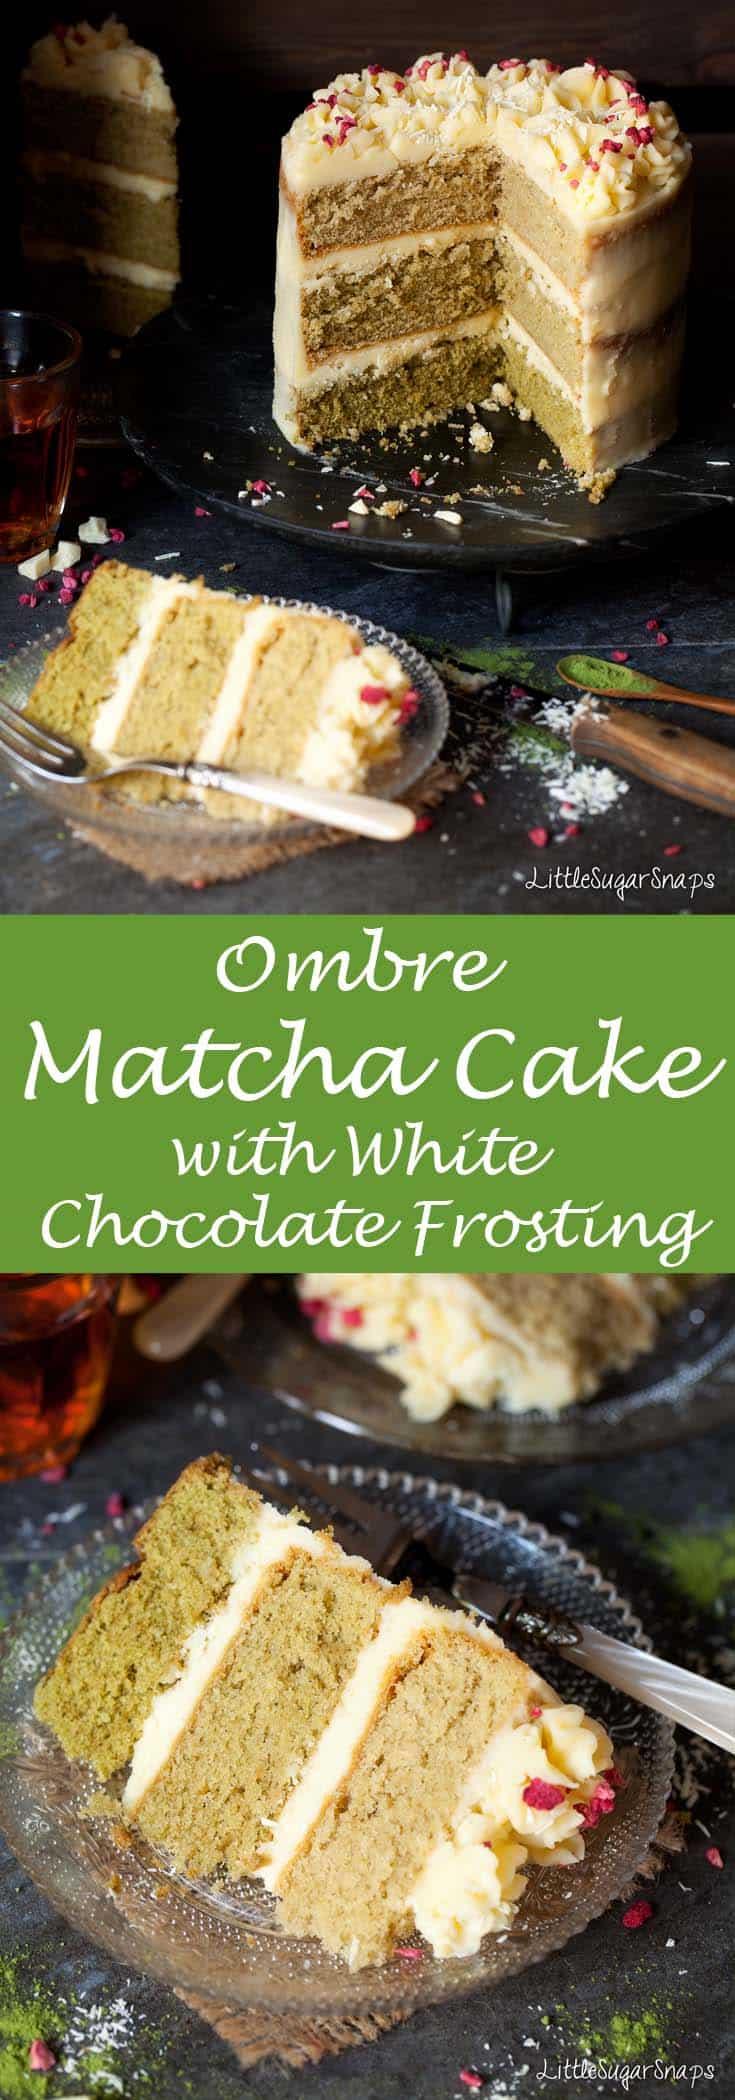 Matcha Cake #matcha #matchacake #ombrecake #matchatea #teacake